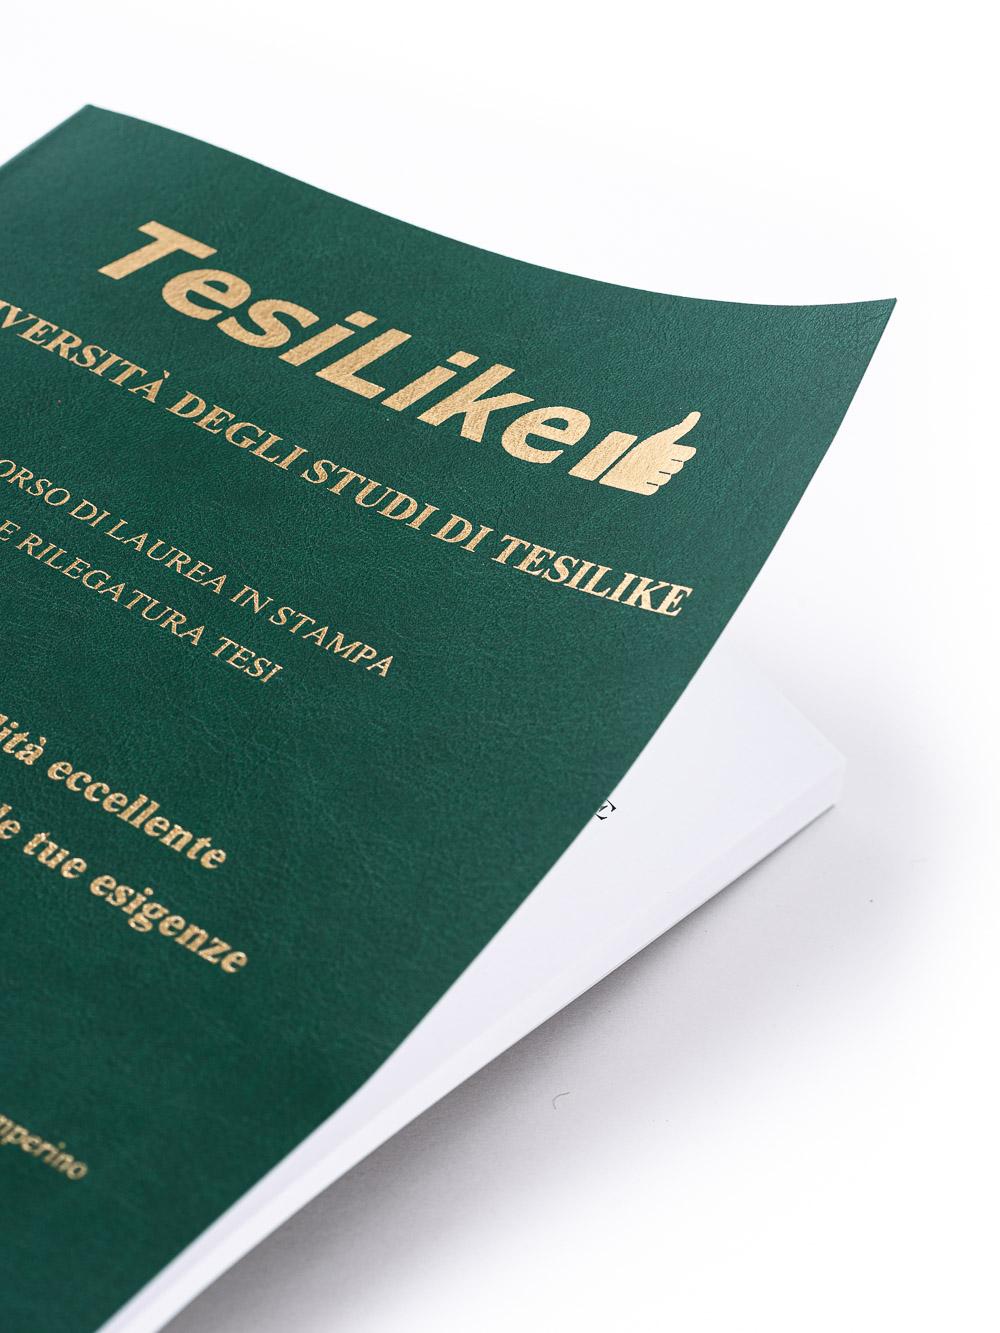 copertina-tesi-flessibile-morbida-verde-frontespizio-oro-dettaglio-tesilike